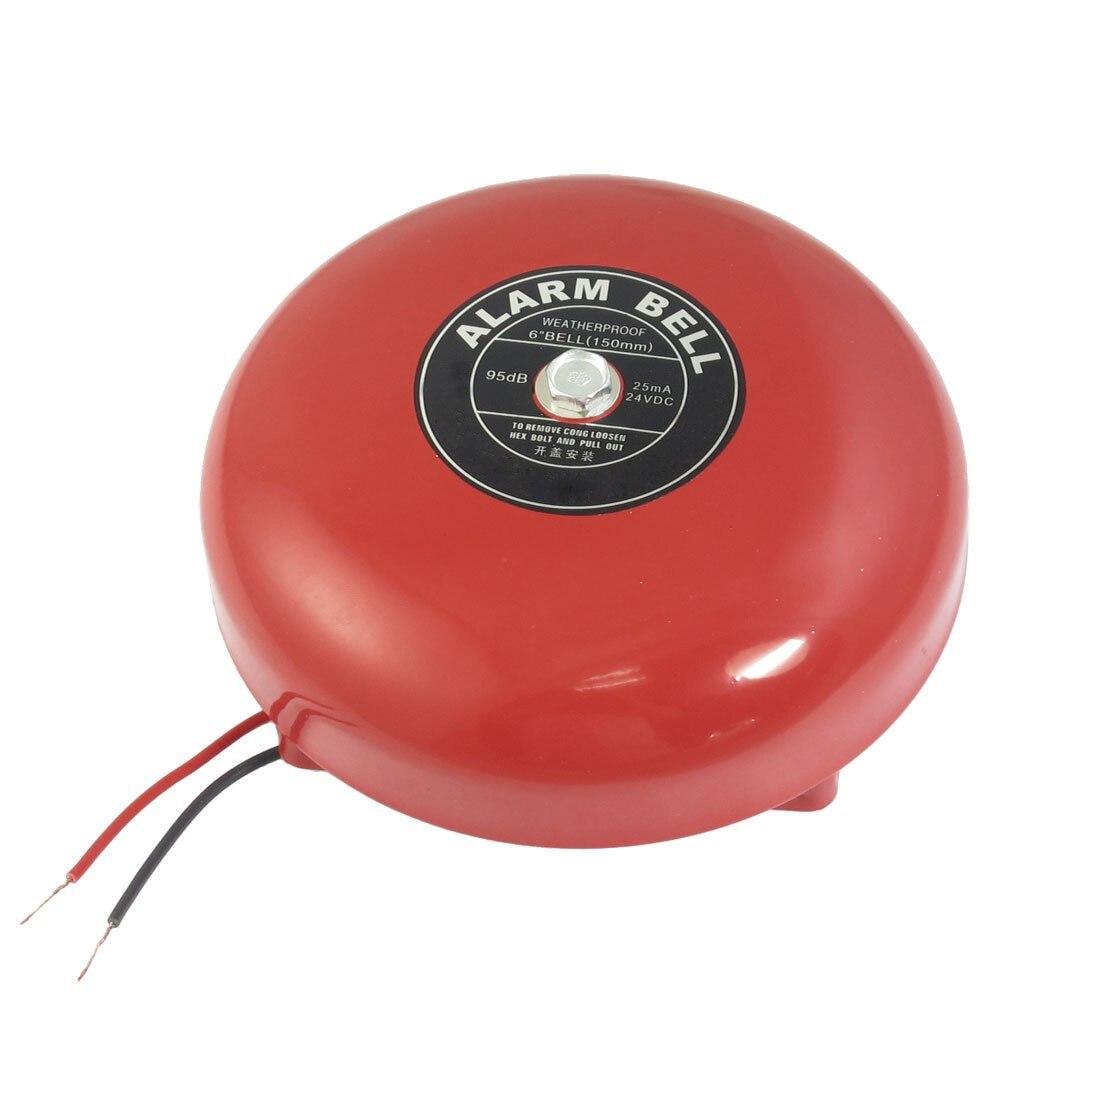 2 pcs of MOOL DC 24V 25mA 95db 150mm 6 Diameter Metal Electric Round Alarm Bell Red2 pcs of MOOL DC 24V 25mA 95db 150mm 6 Diameter Metal Electric Round Alarm Bell Red